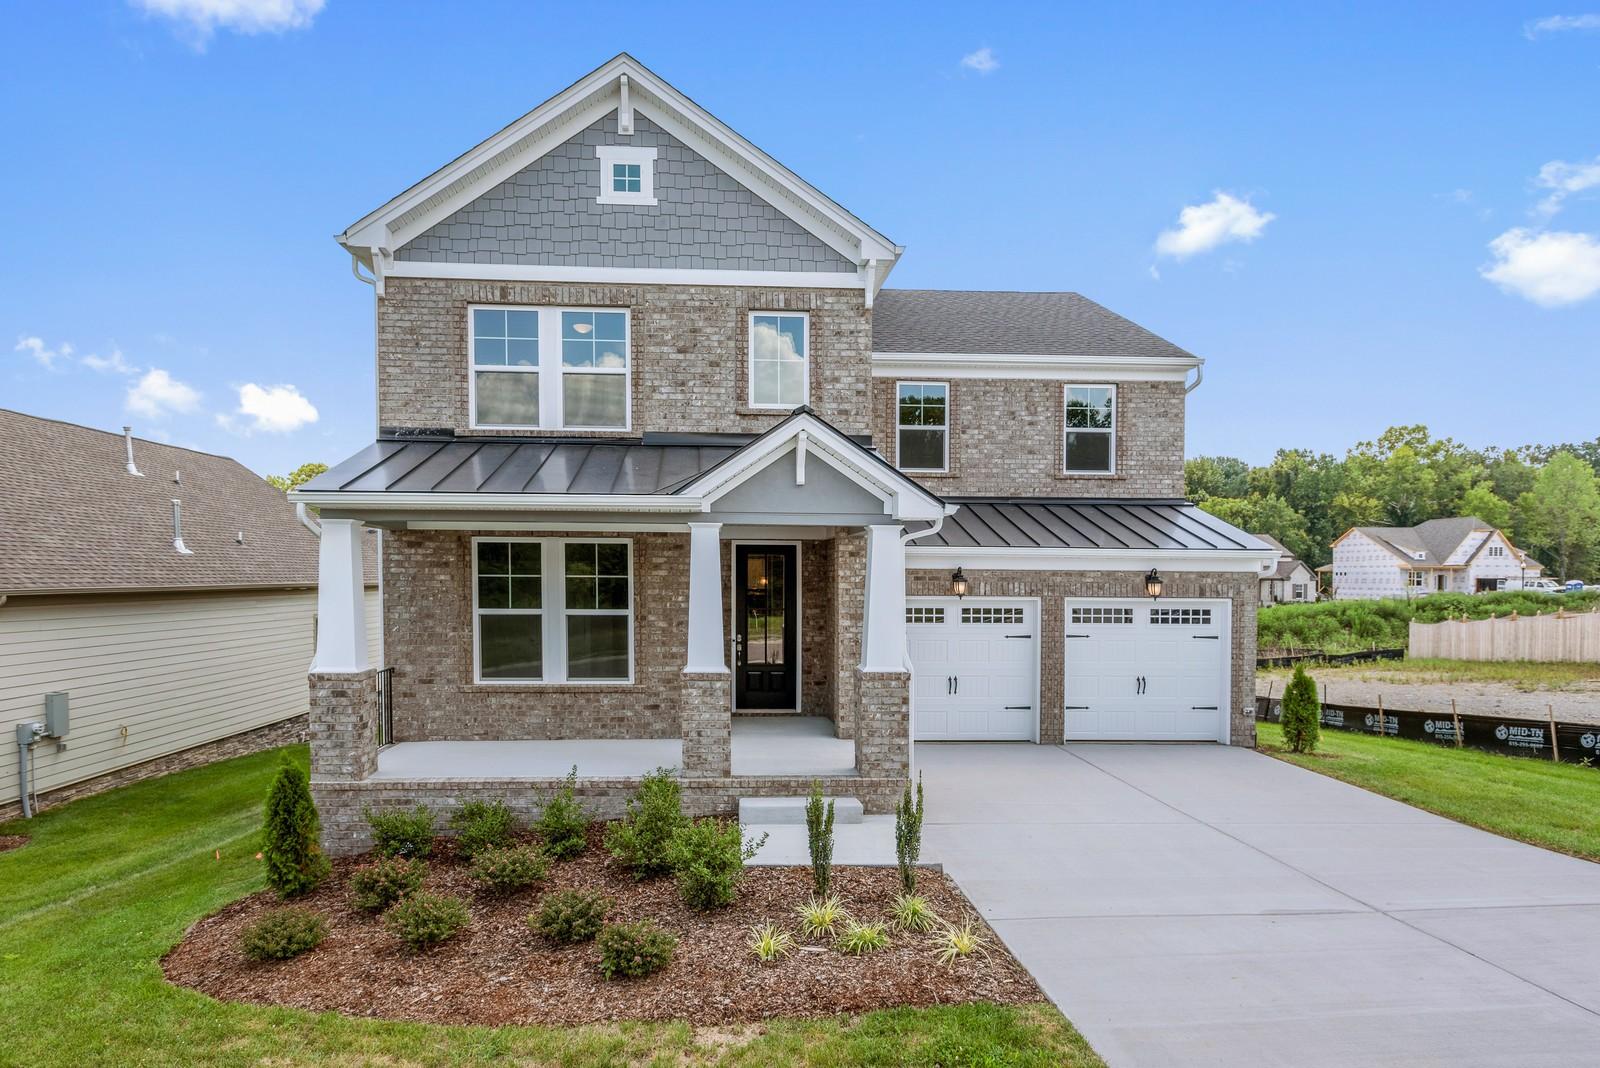 1092 River Oaks Blvd Property Photo - Lebanon, TN real estate listing